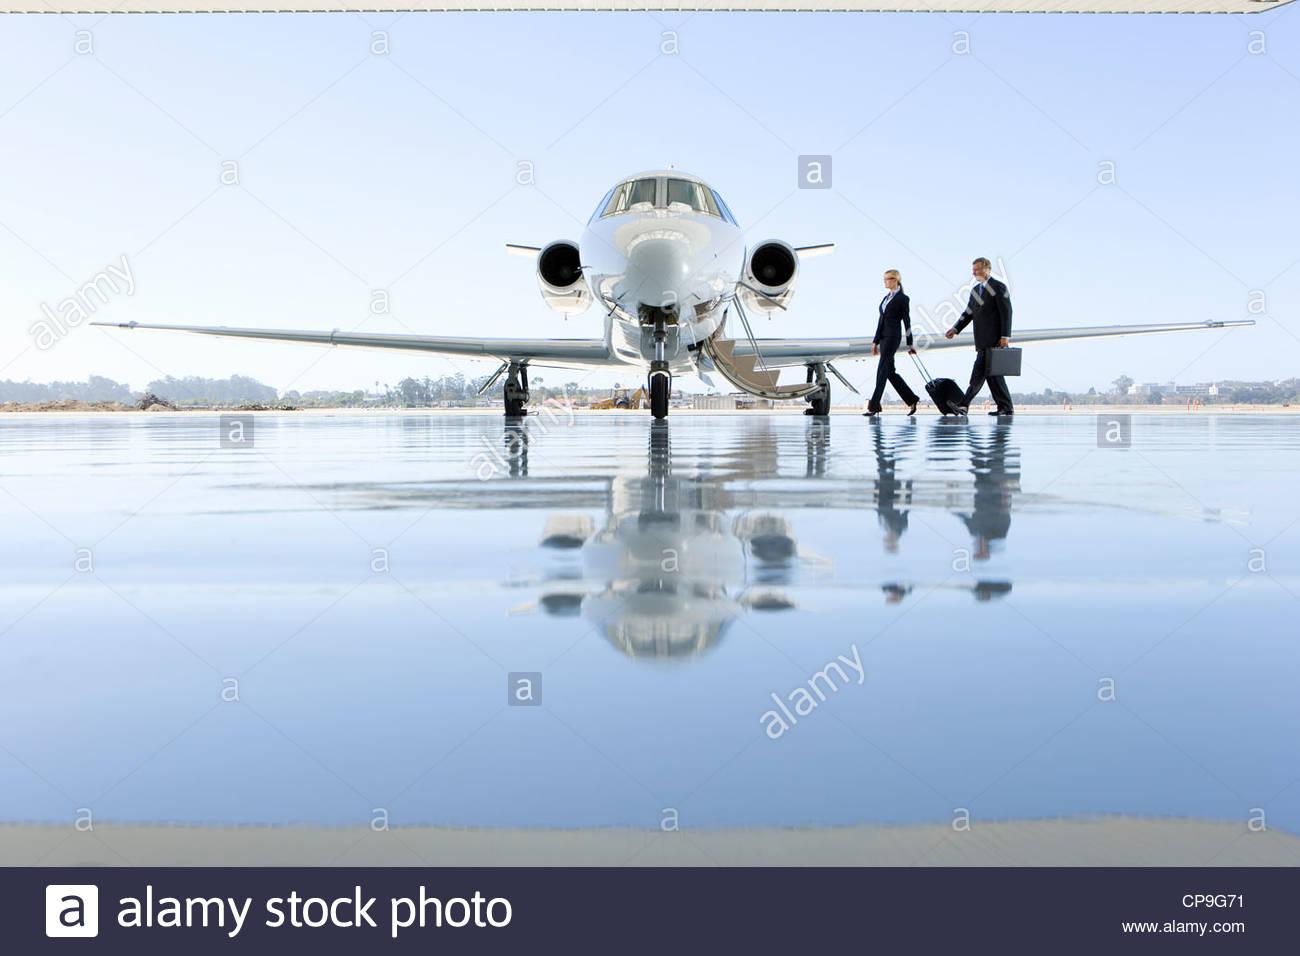 Pilot and flight attendant boarding aeroplane on runway - Stock Image